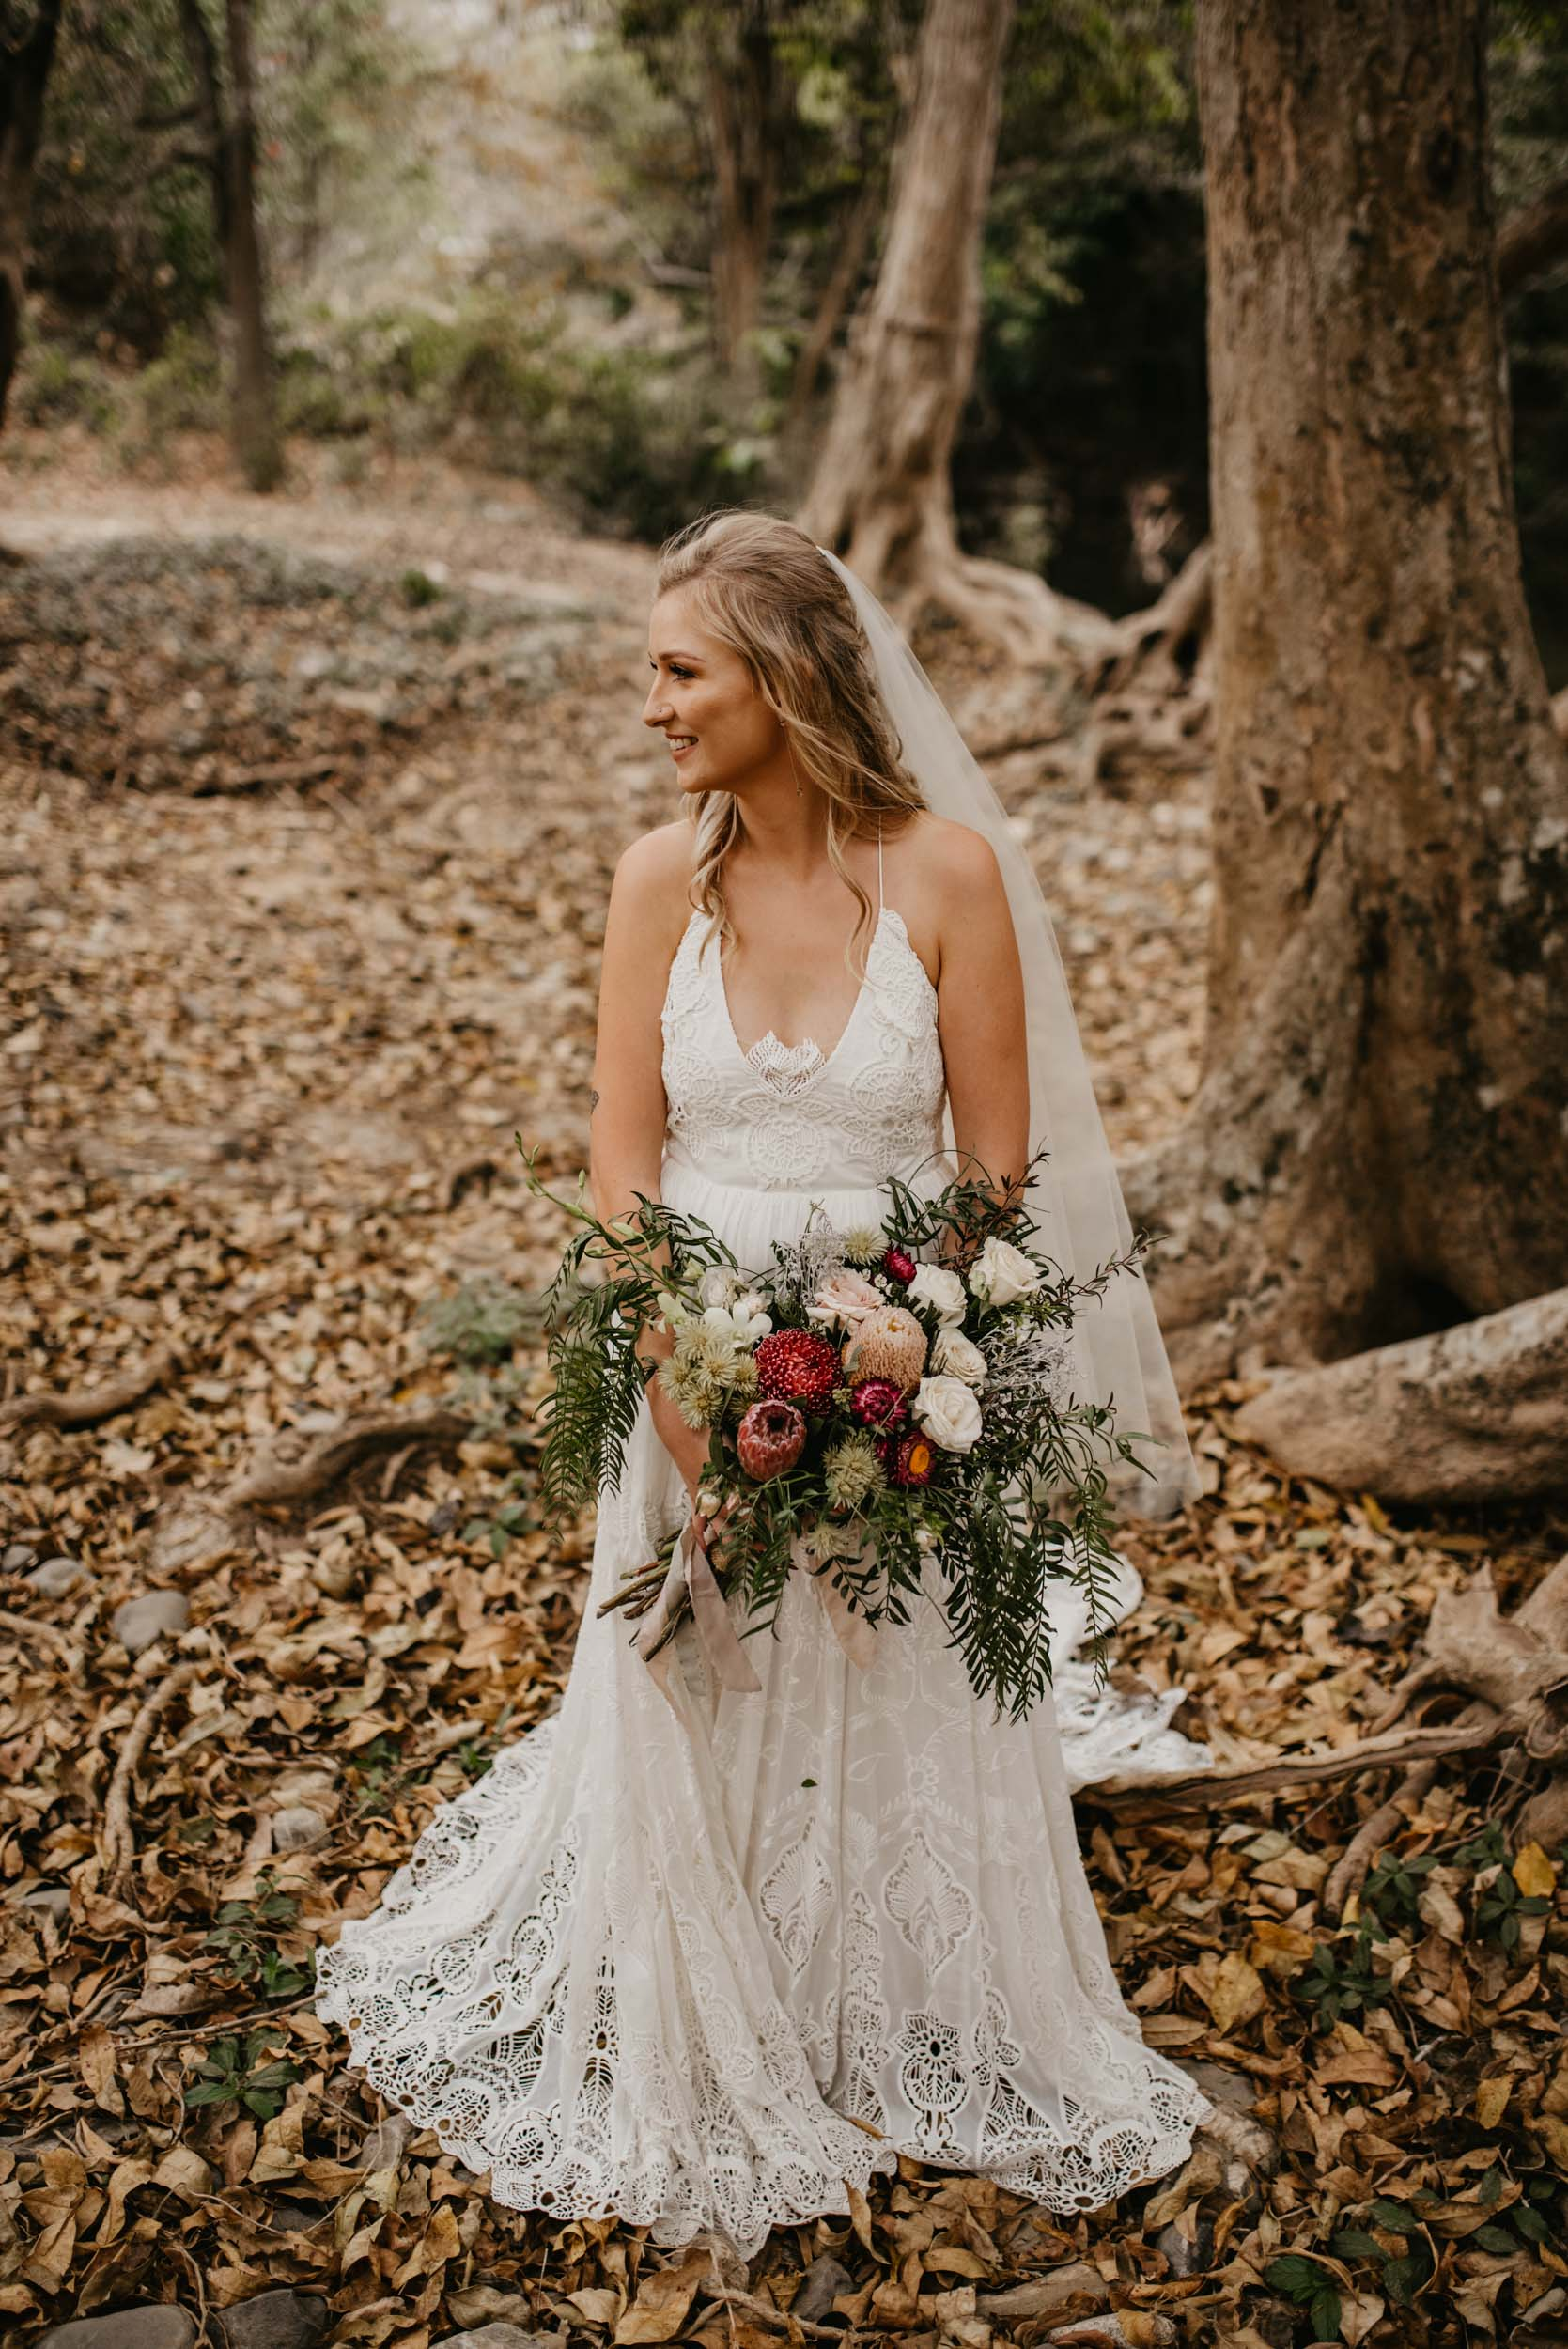 The Raw Photographer - Cairns Wedding Photographer - Laloli - Cairns Garden Wedding - Wedding Dress-54.jpg